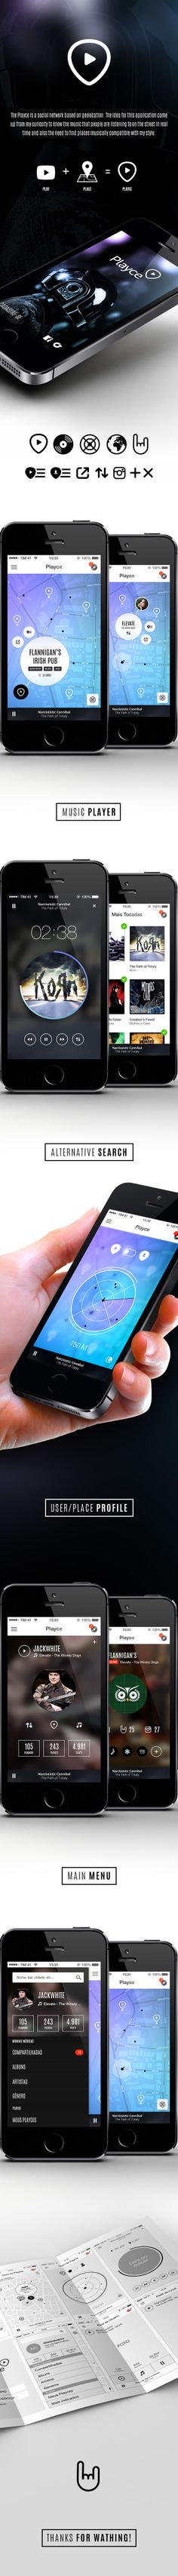 Playce - App Design by Leonardo Navarro, via Behance Ui design mobile Web Design, App Ui Design, Dashboard Design, Graphic Design, Gui Interface, User Interface Design, Wireframe, Apps, Mobile Ui Design